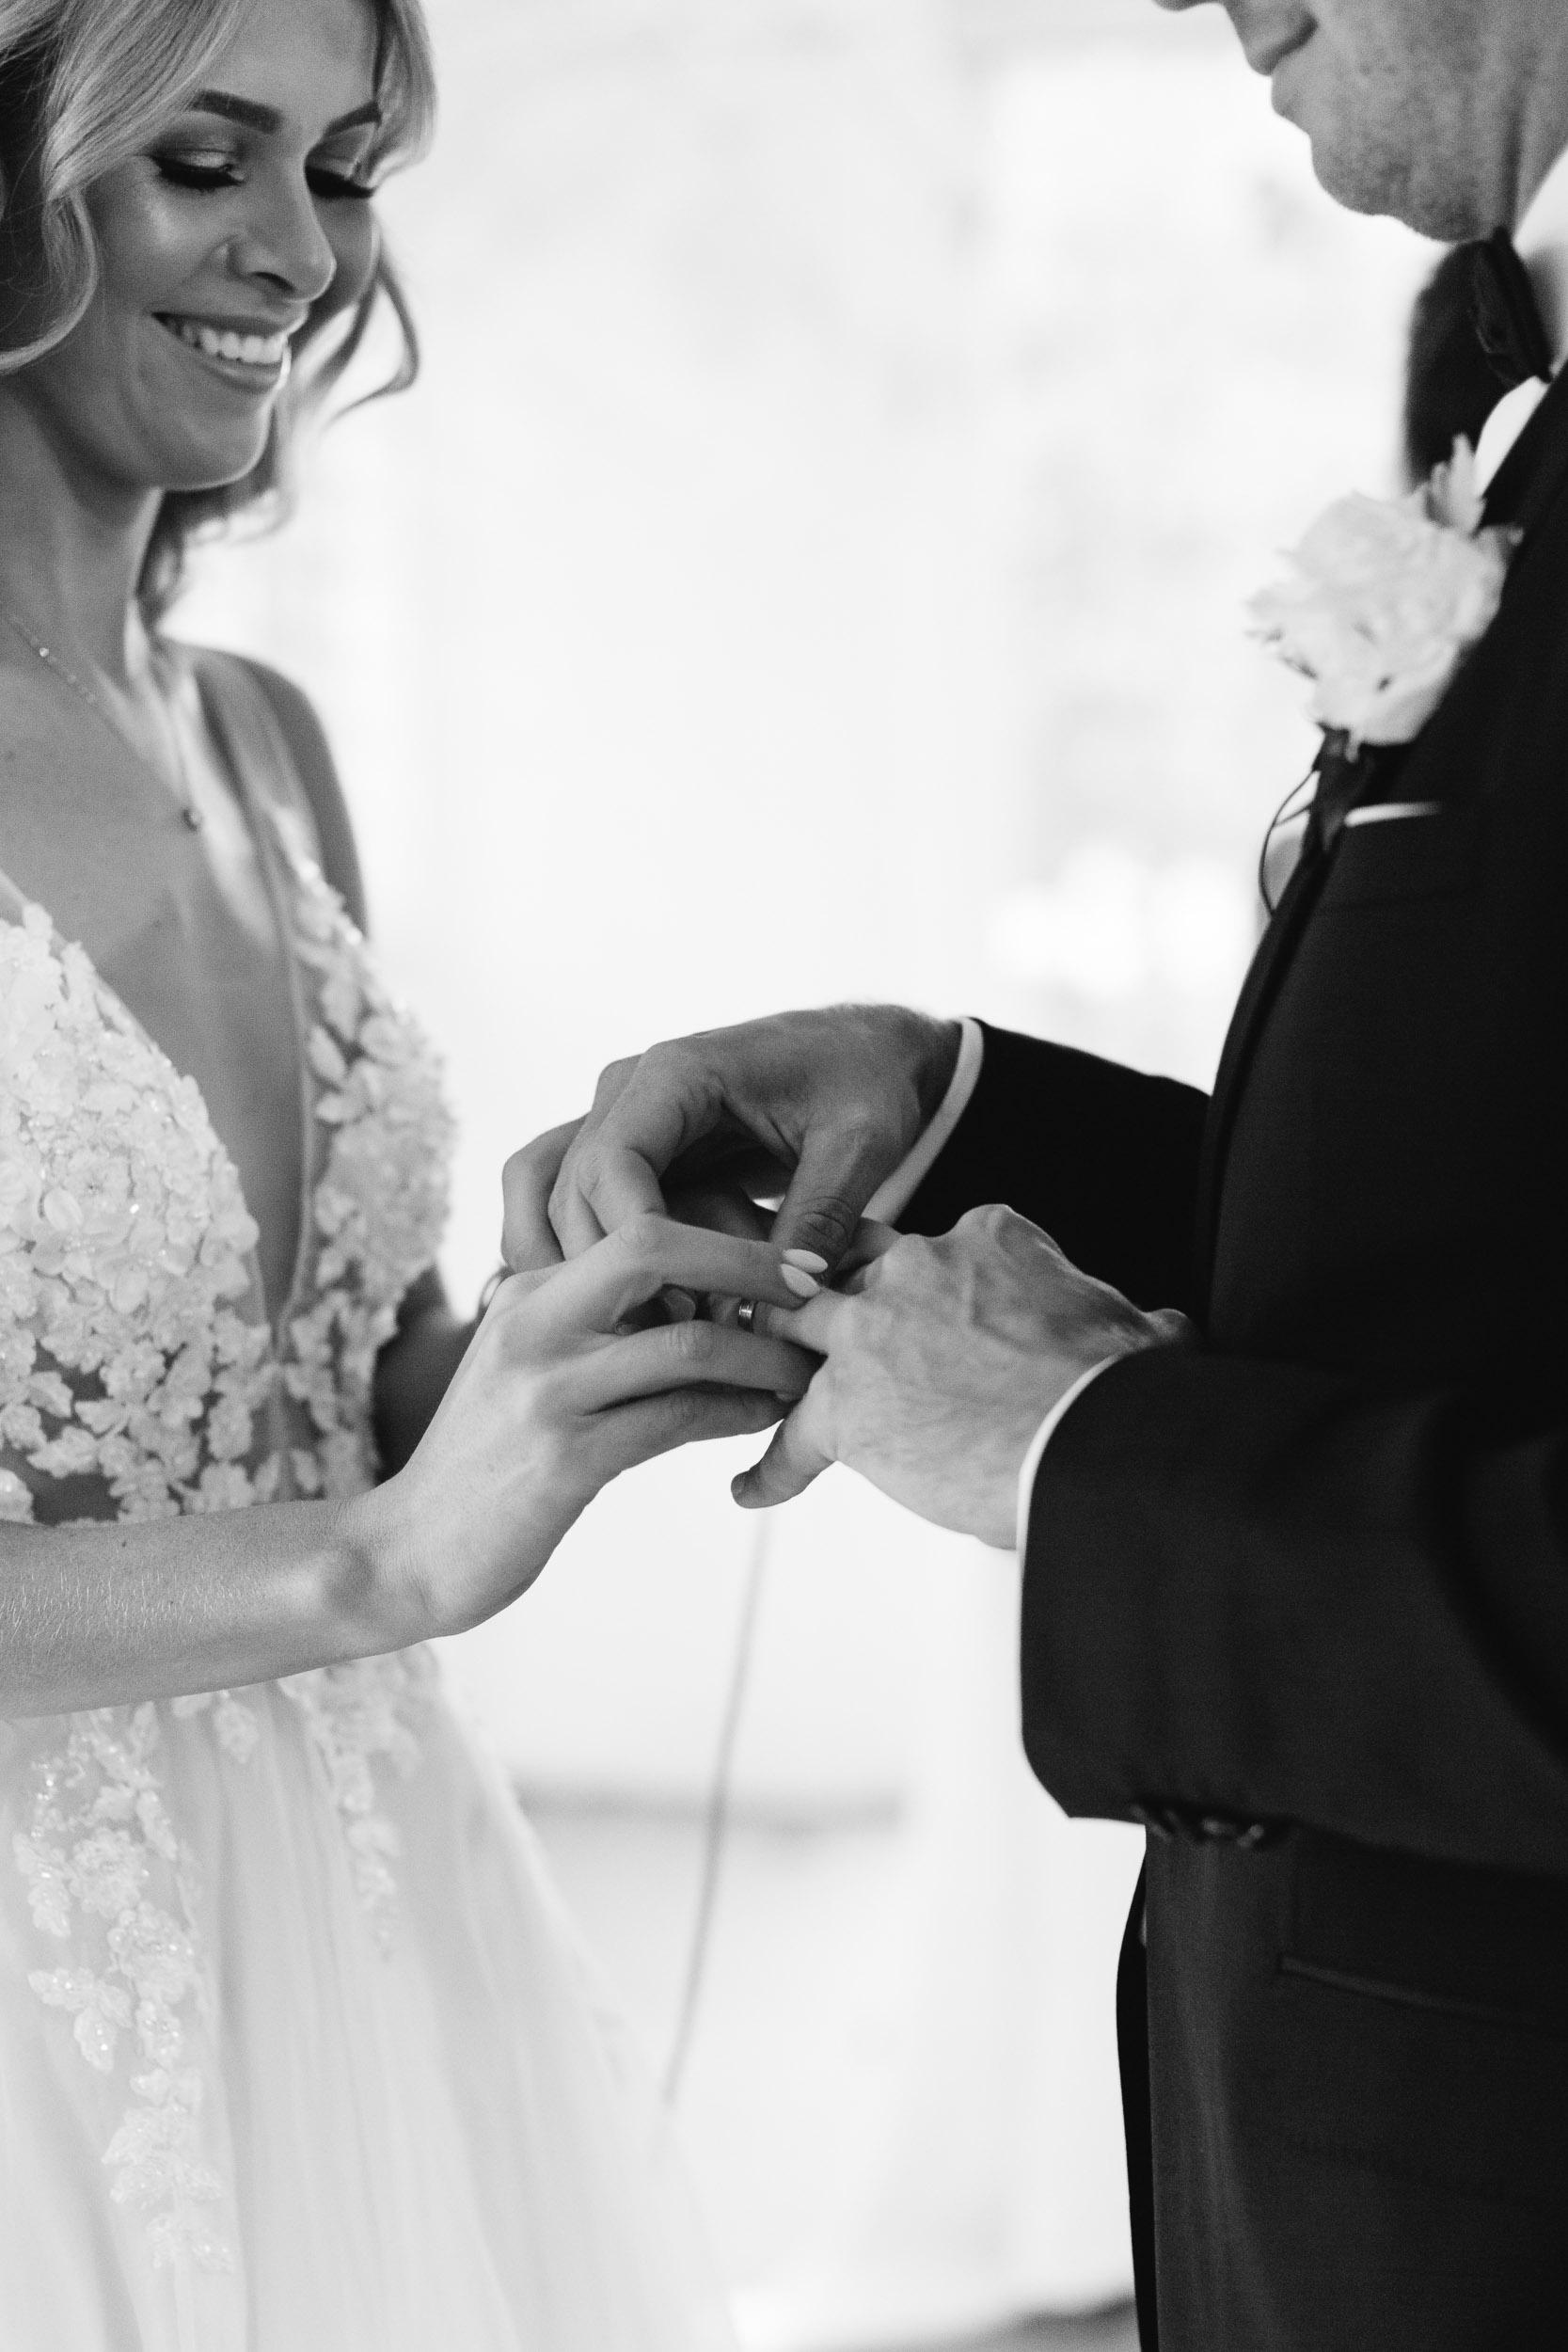 Kas-Richards-Mornington-Peninsula-Private-Property-Wedding-Marianna-Hardwick-Gown-285.jpg